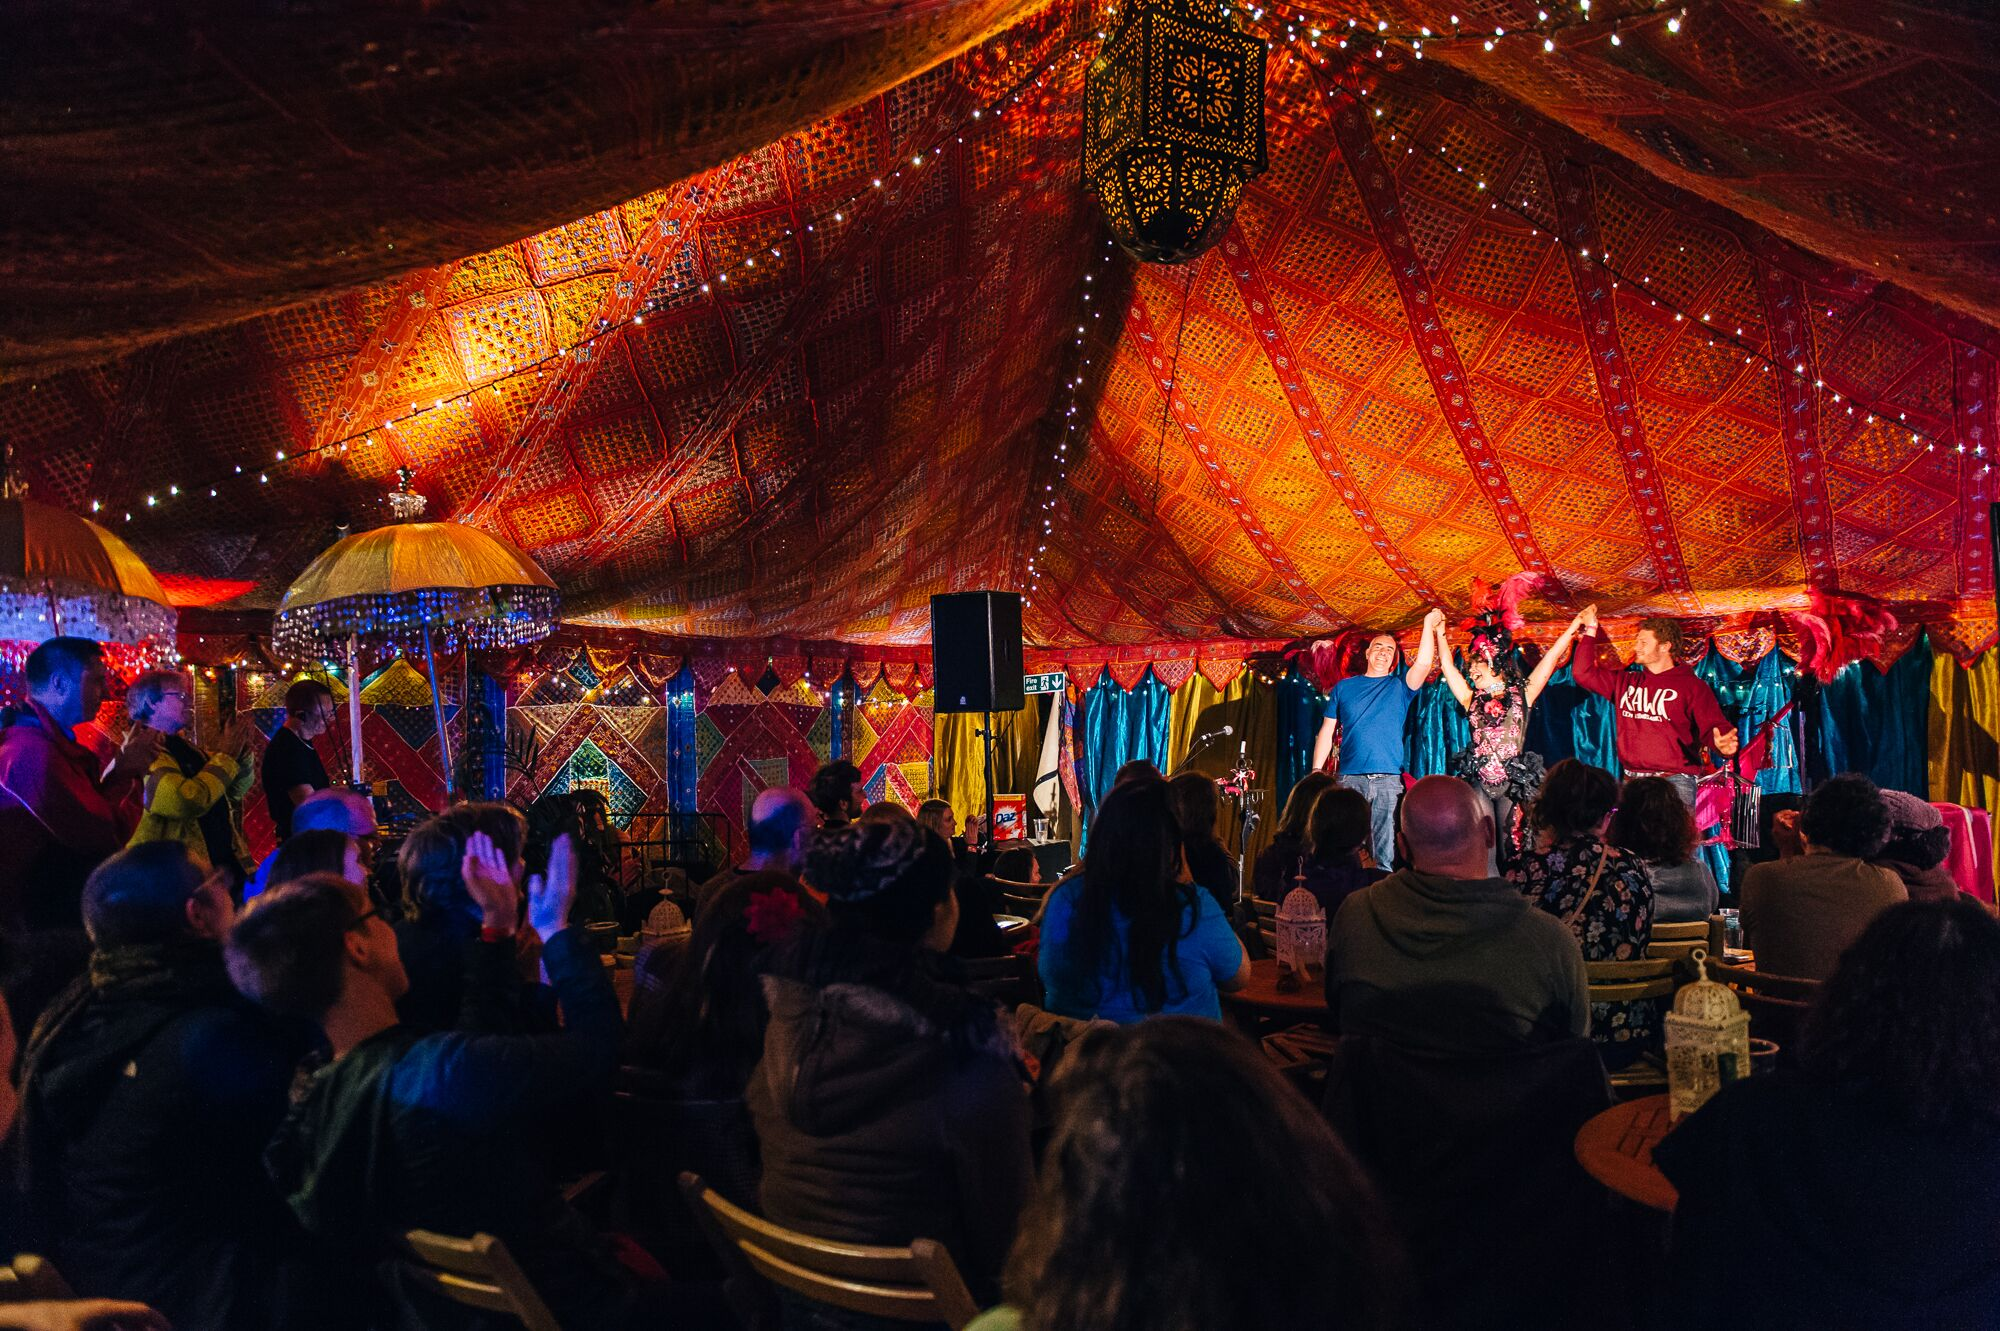 50th Birthday Party Ideas for Men & Women | Arabian Tent ...